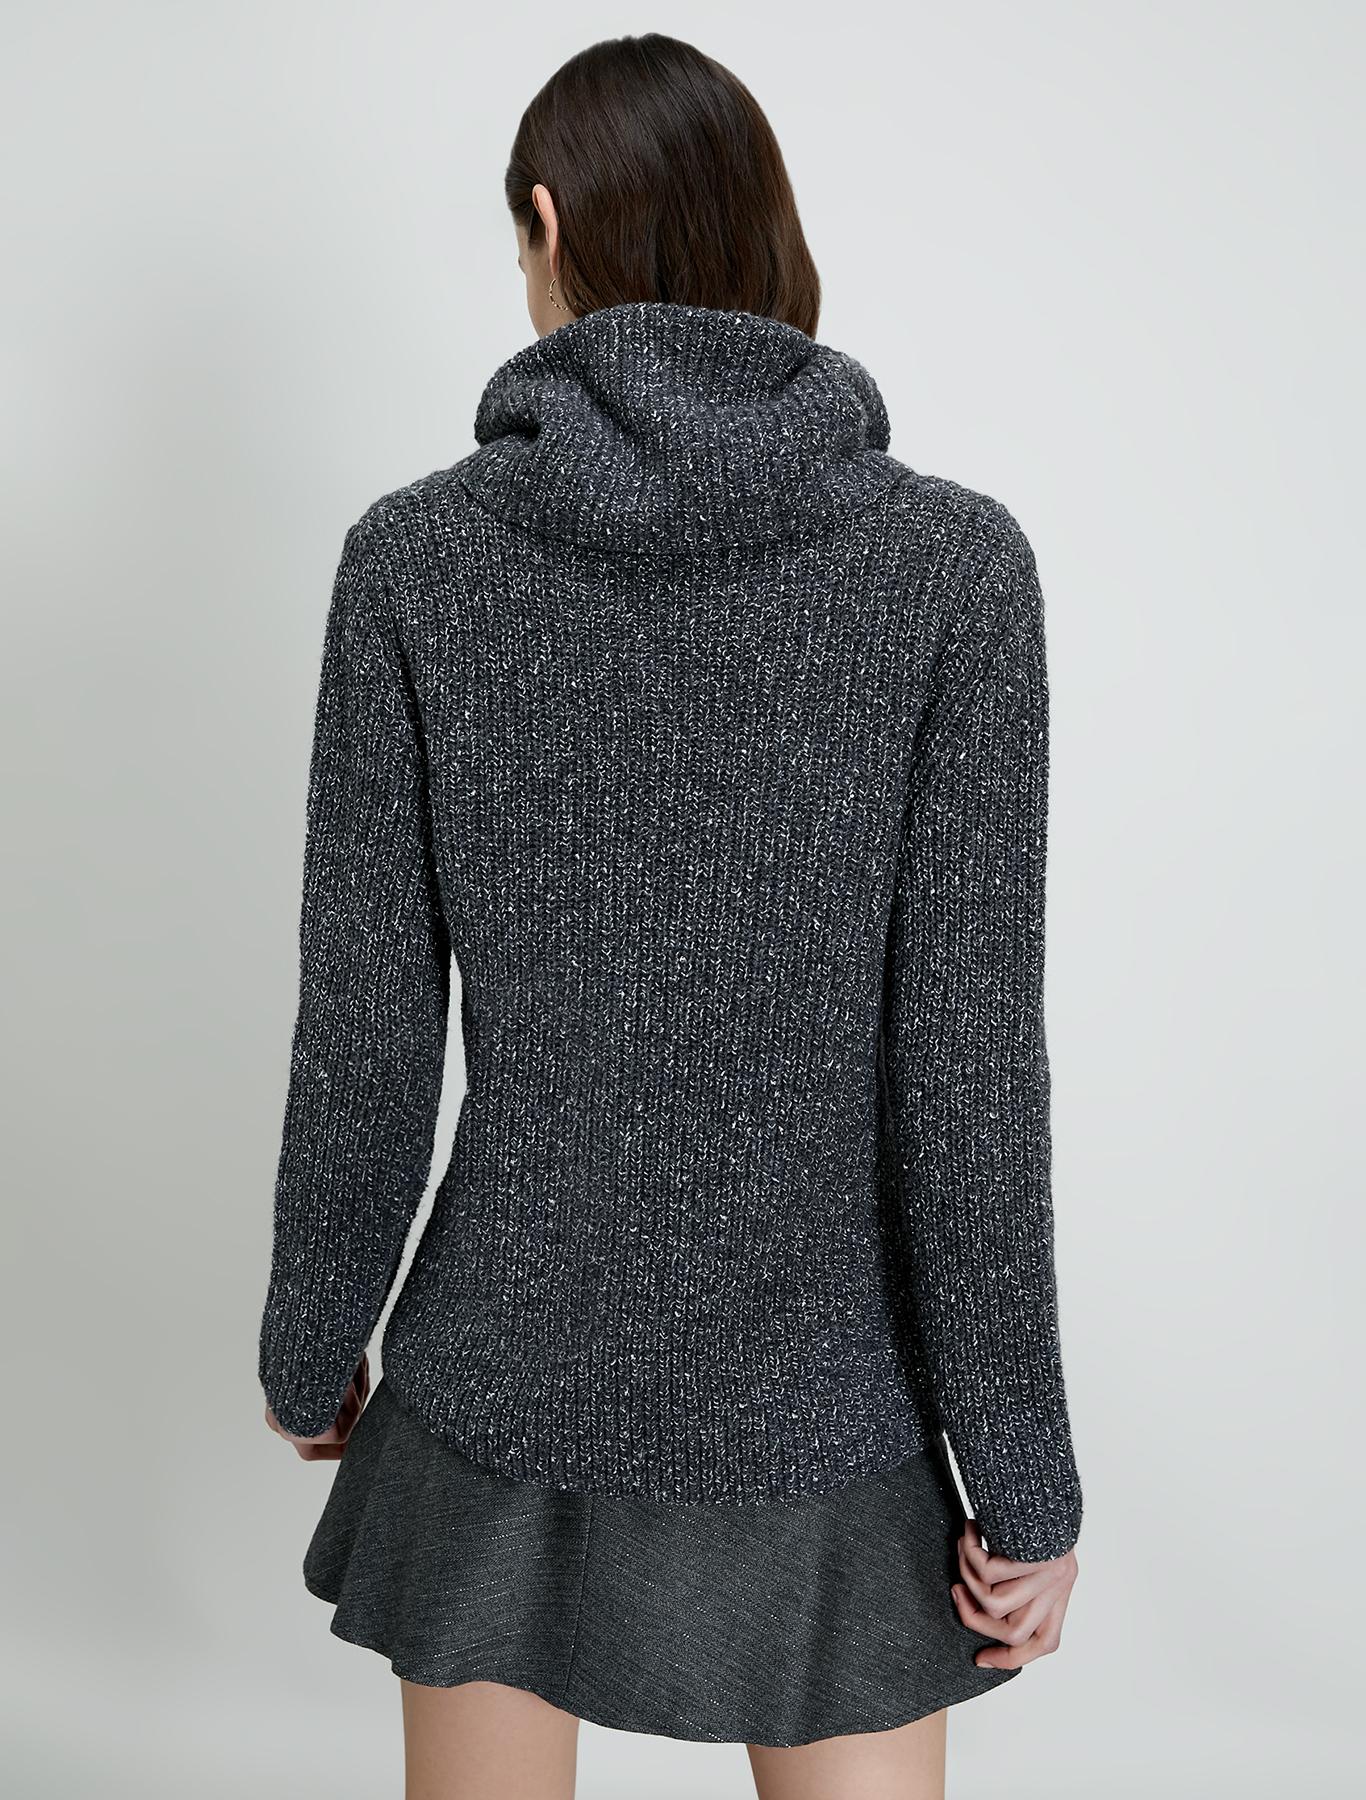 English ribbed tweed pullover - medium grey - pennyblack